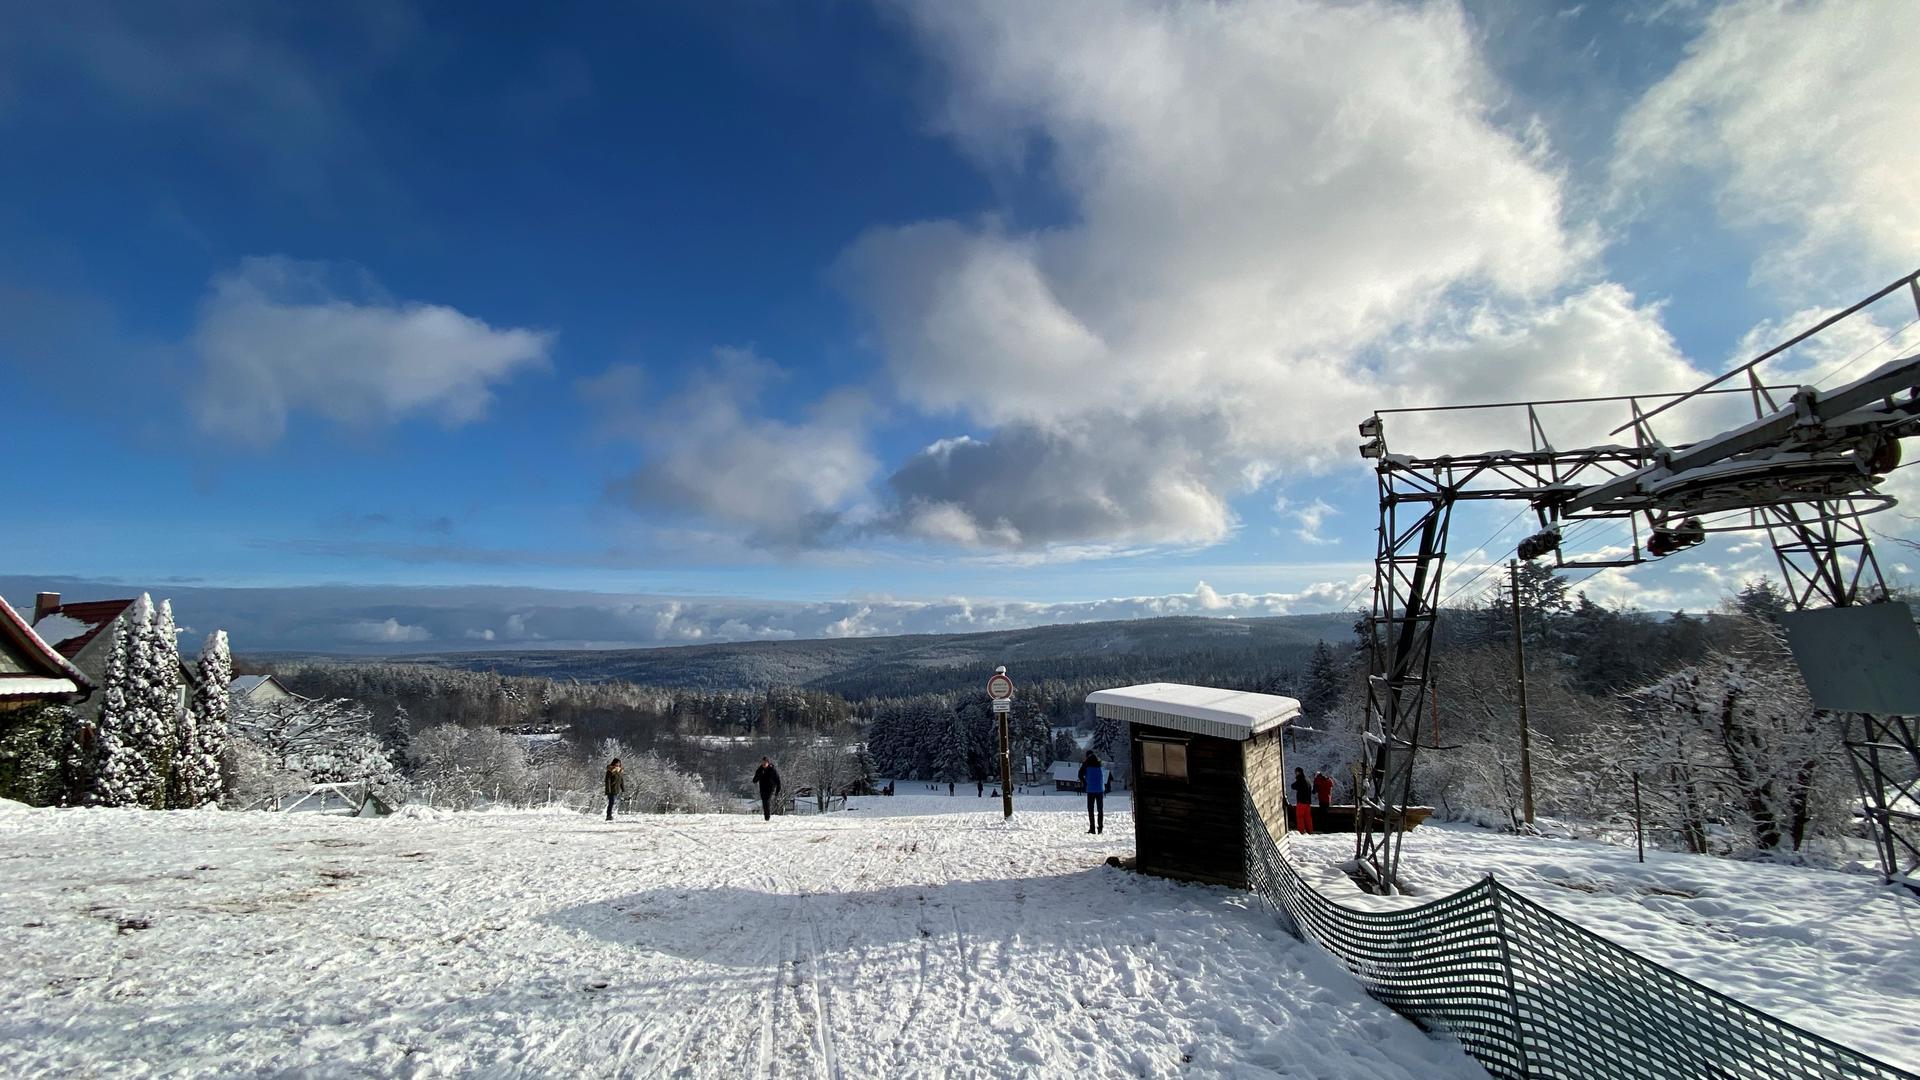 Skihang und Lift